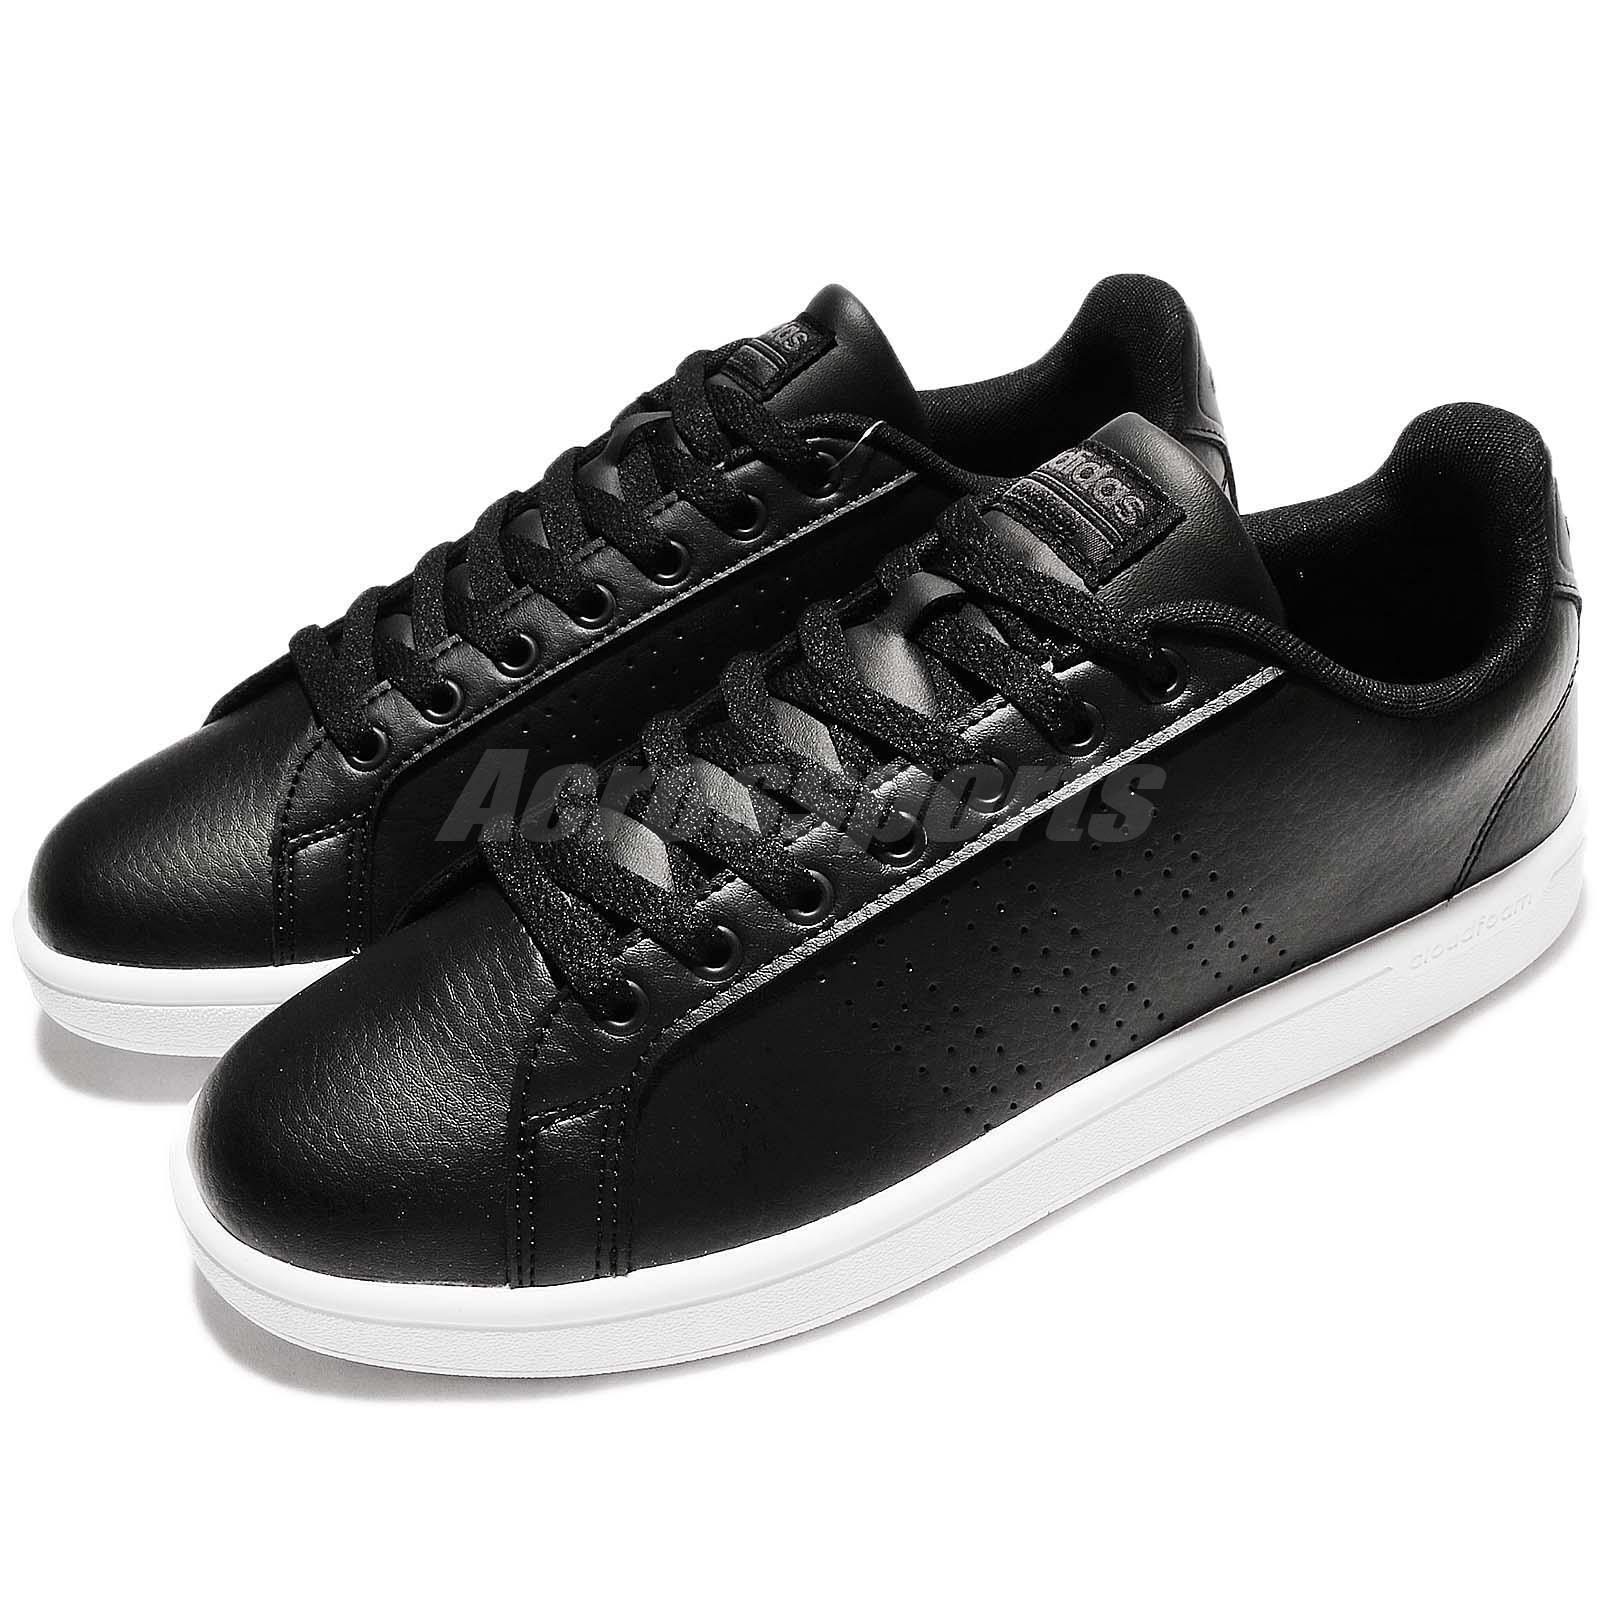 adidas Neo Cloudfoam Advantage Clean Noir Blanc Leather Men Chaussure Basket AW3915